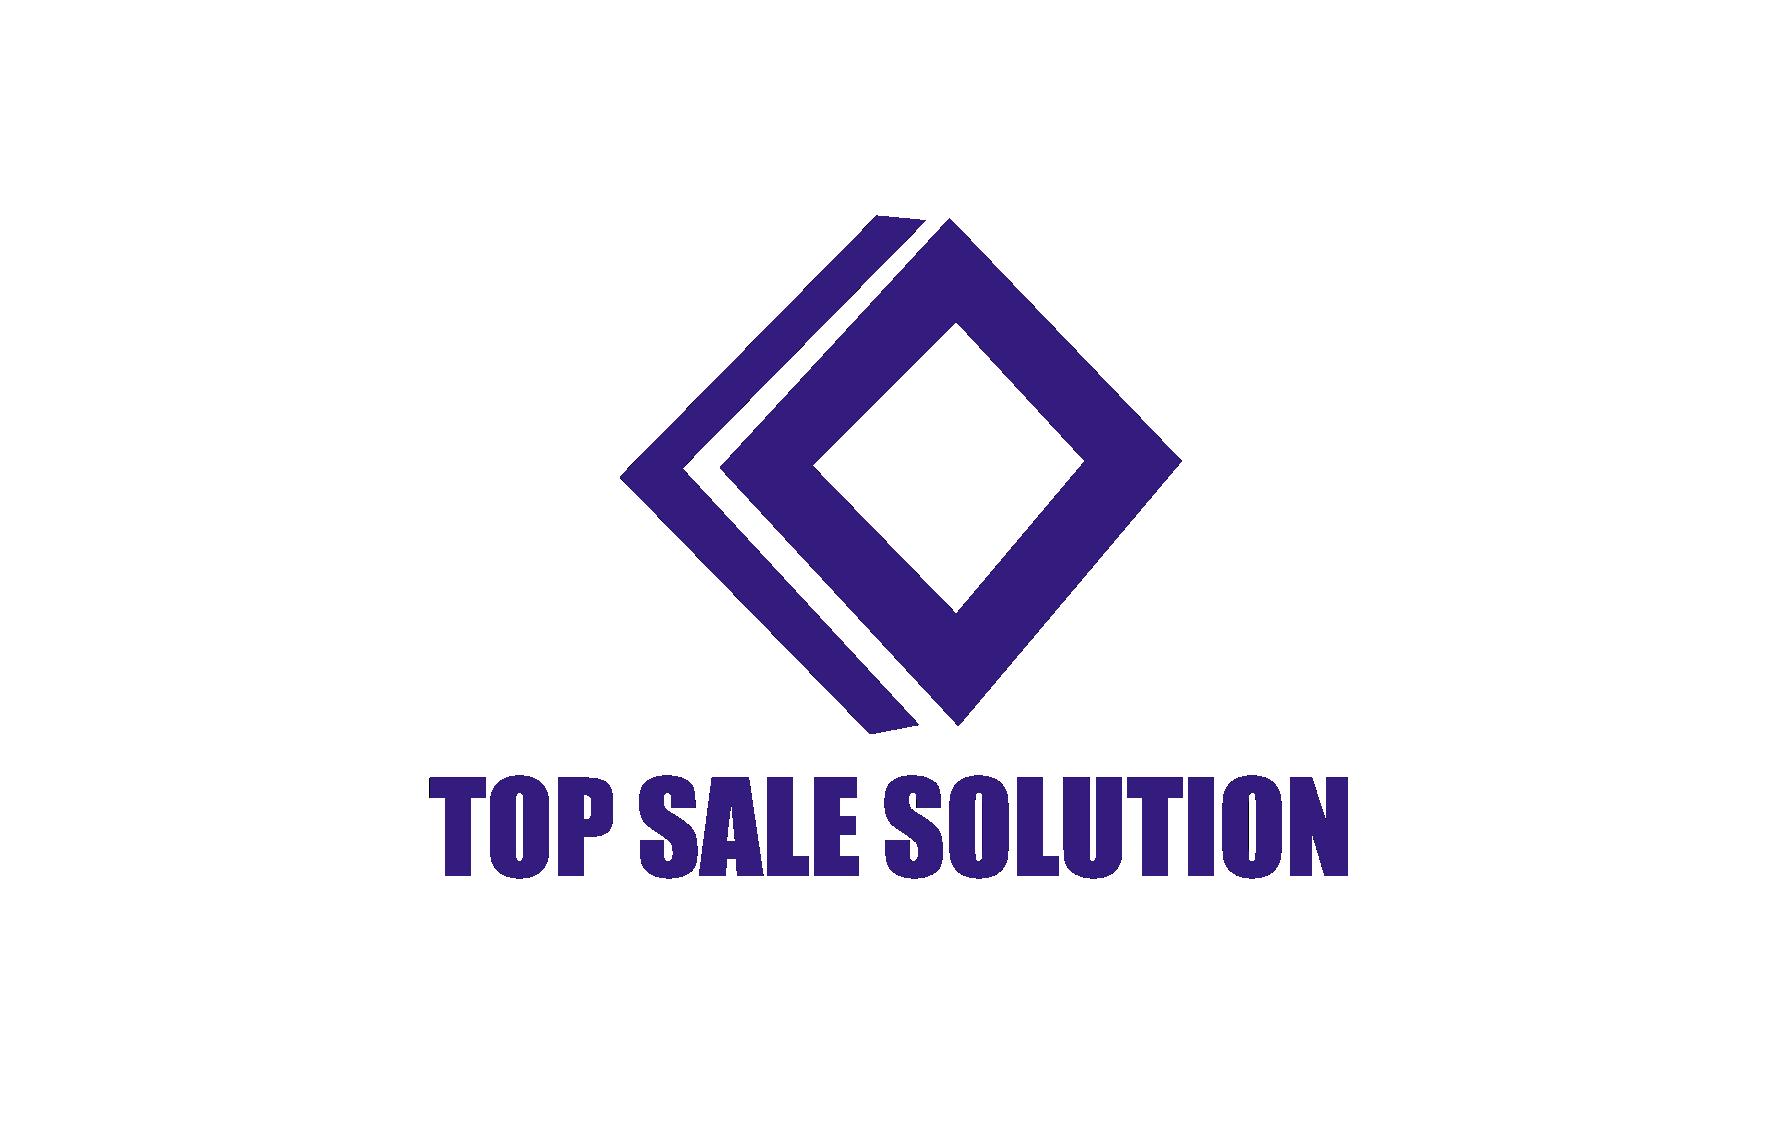 Top Sales Solution